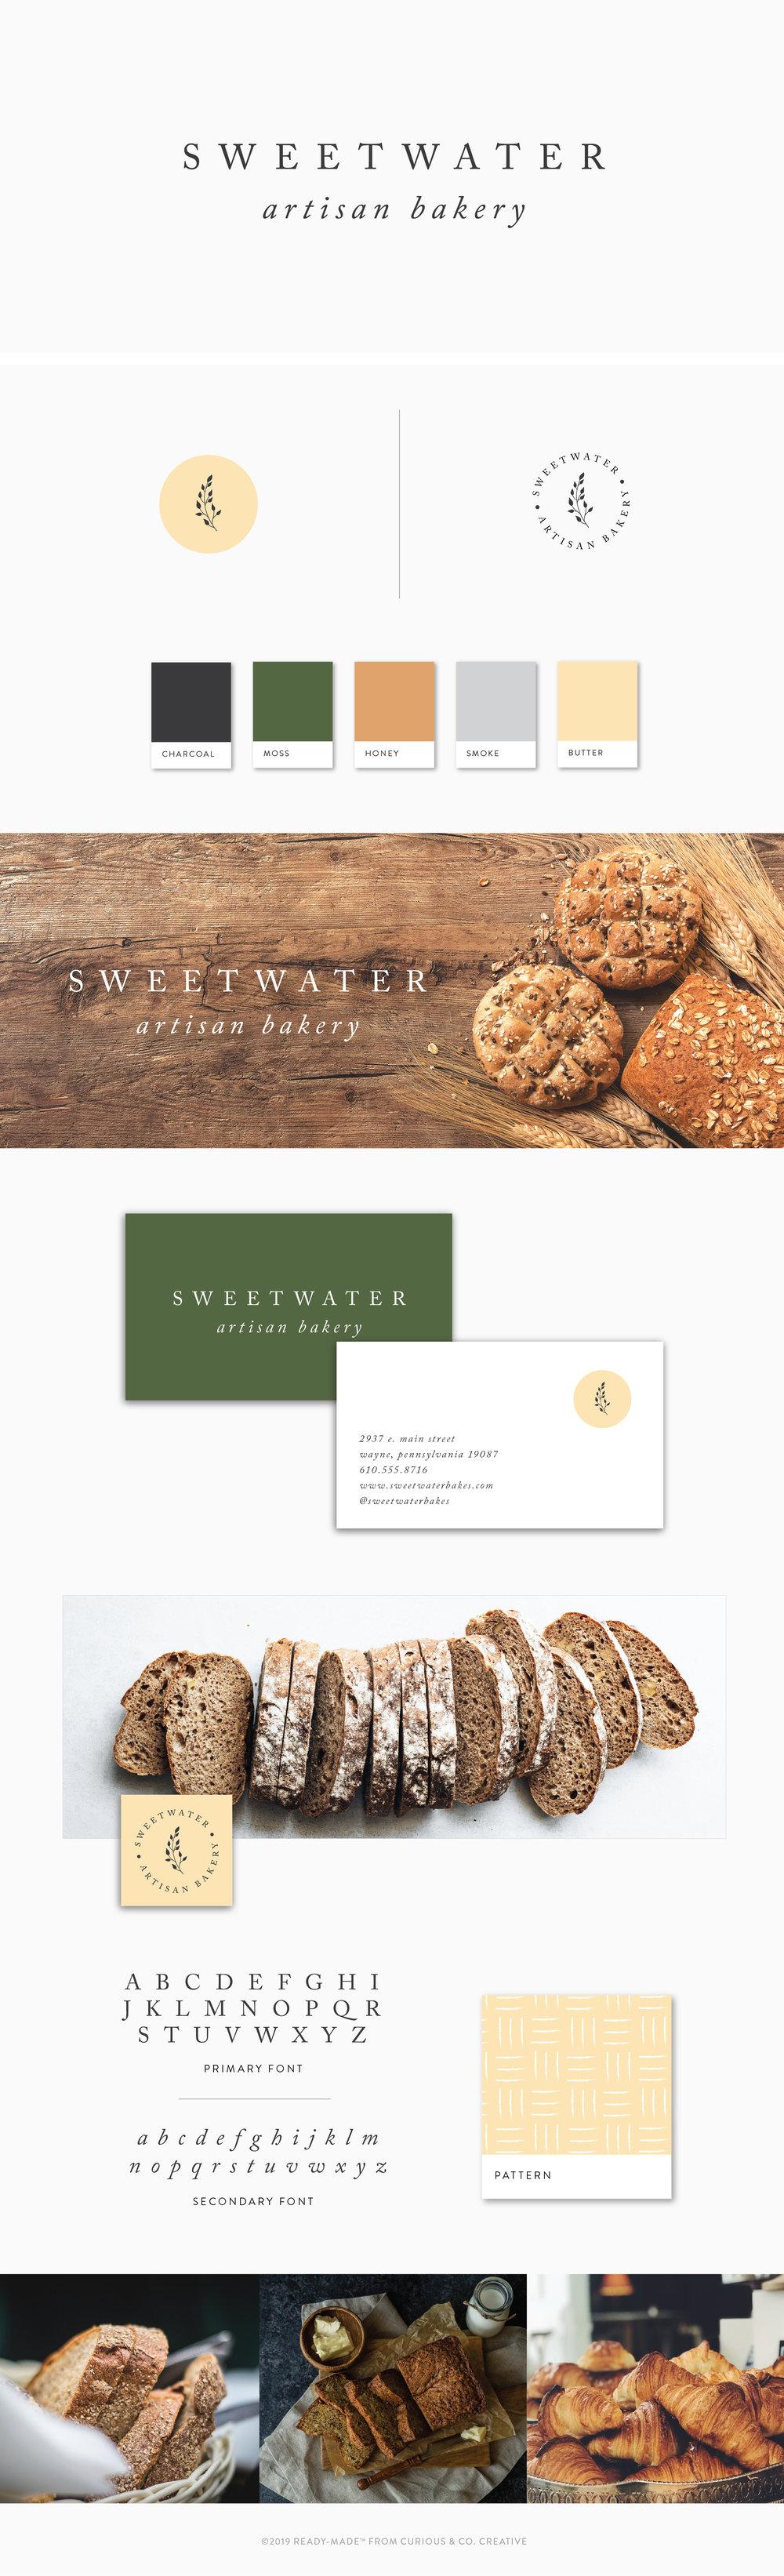 RM_logo_brand_board_sweetwater.jpg